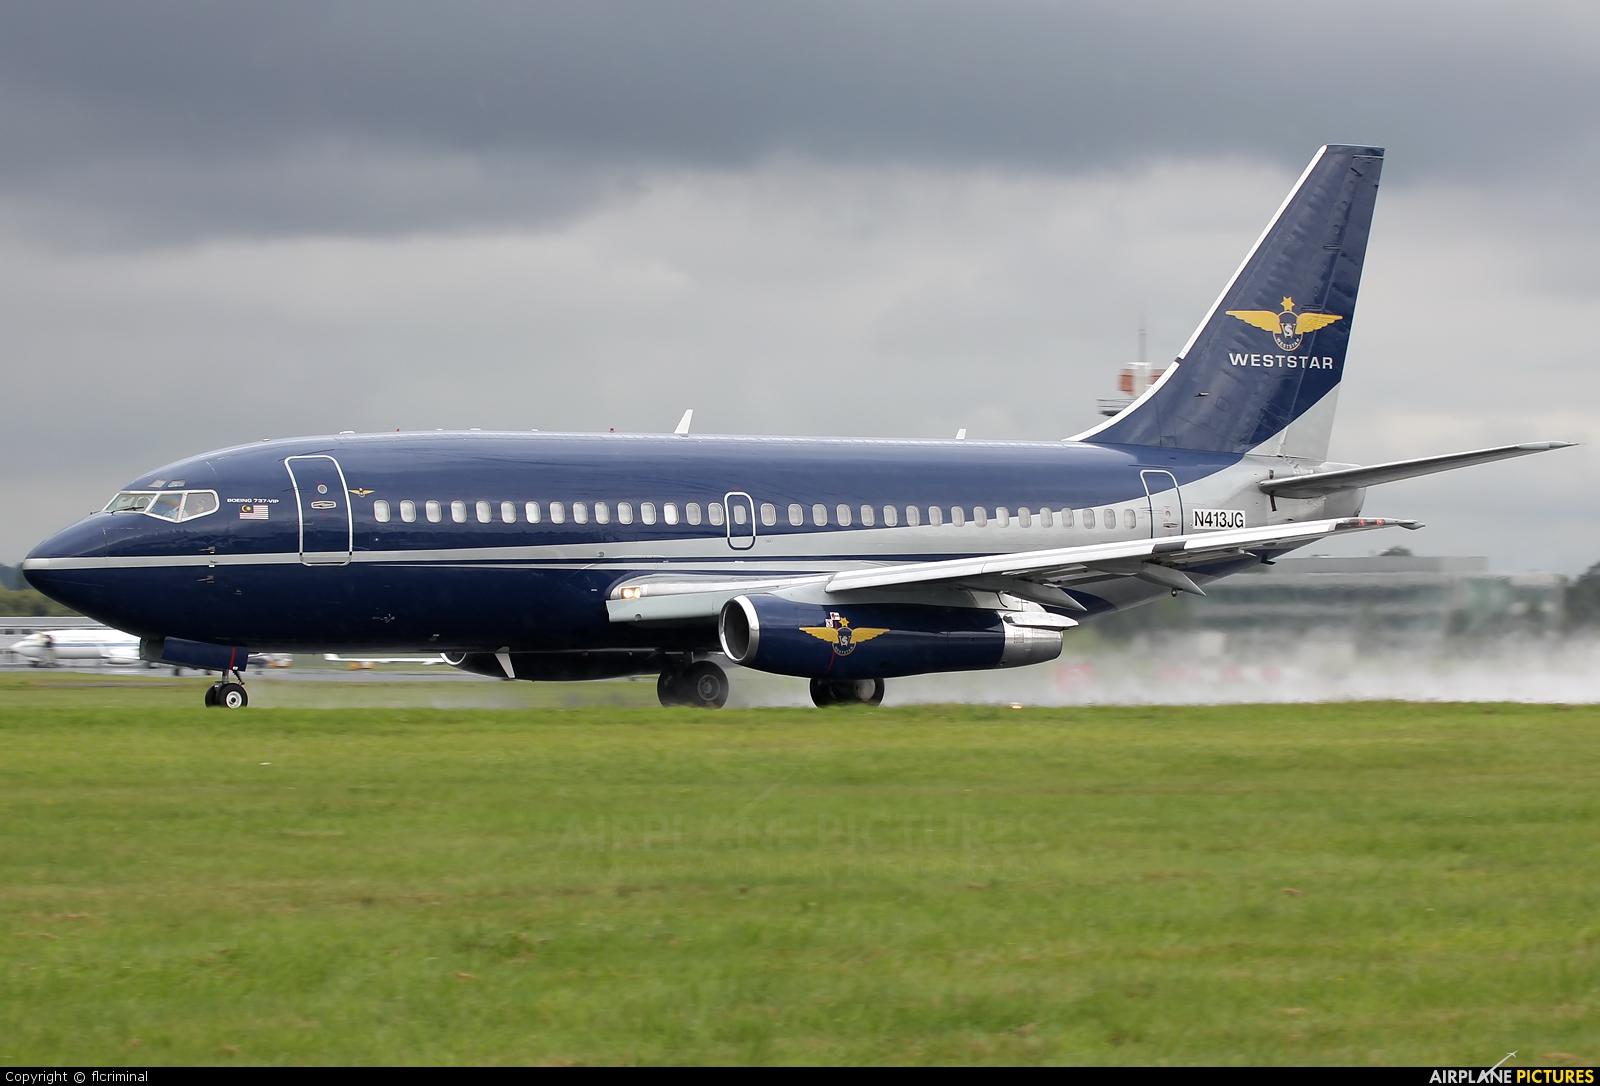 boeing 737 aircraft aviation - photo #37